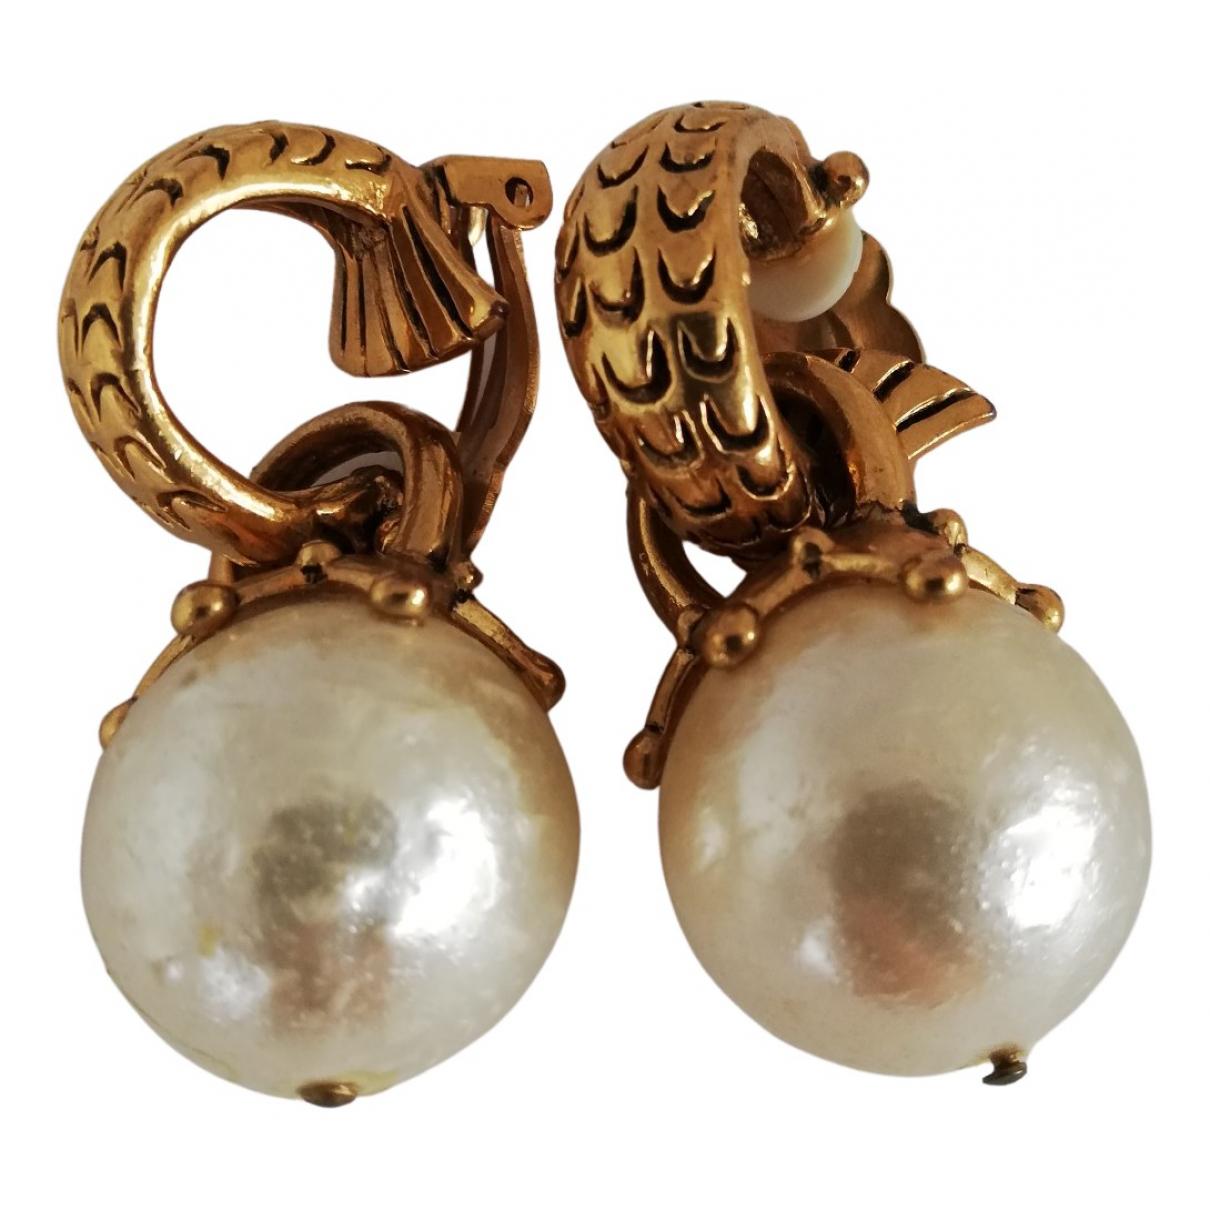 Reminiscence N Gold Gold plated Earrings for Women N